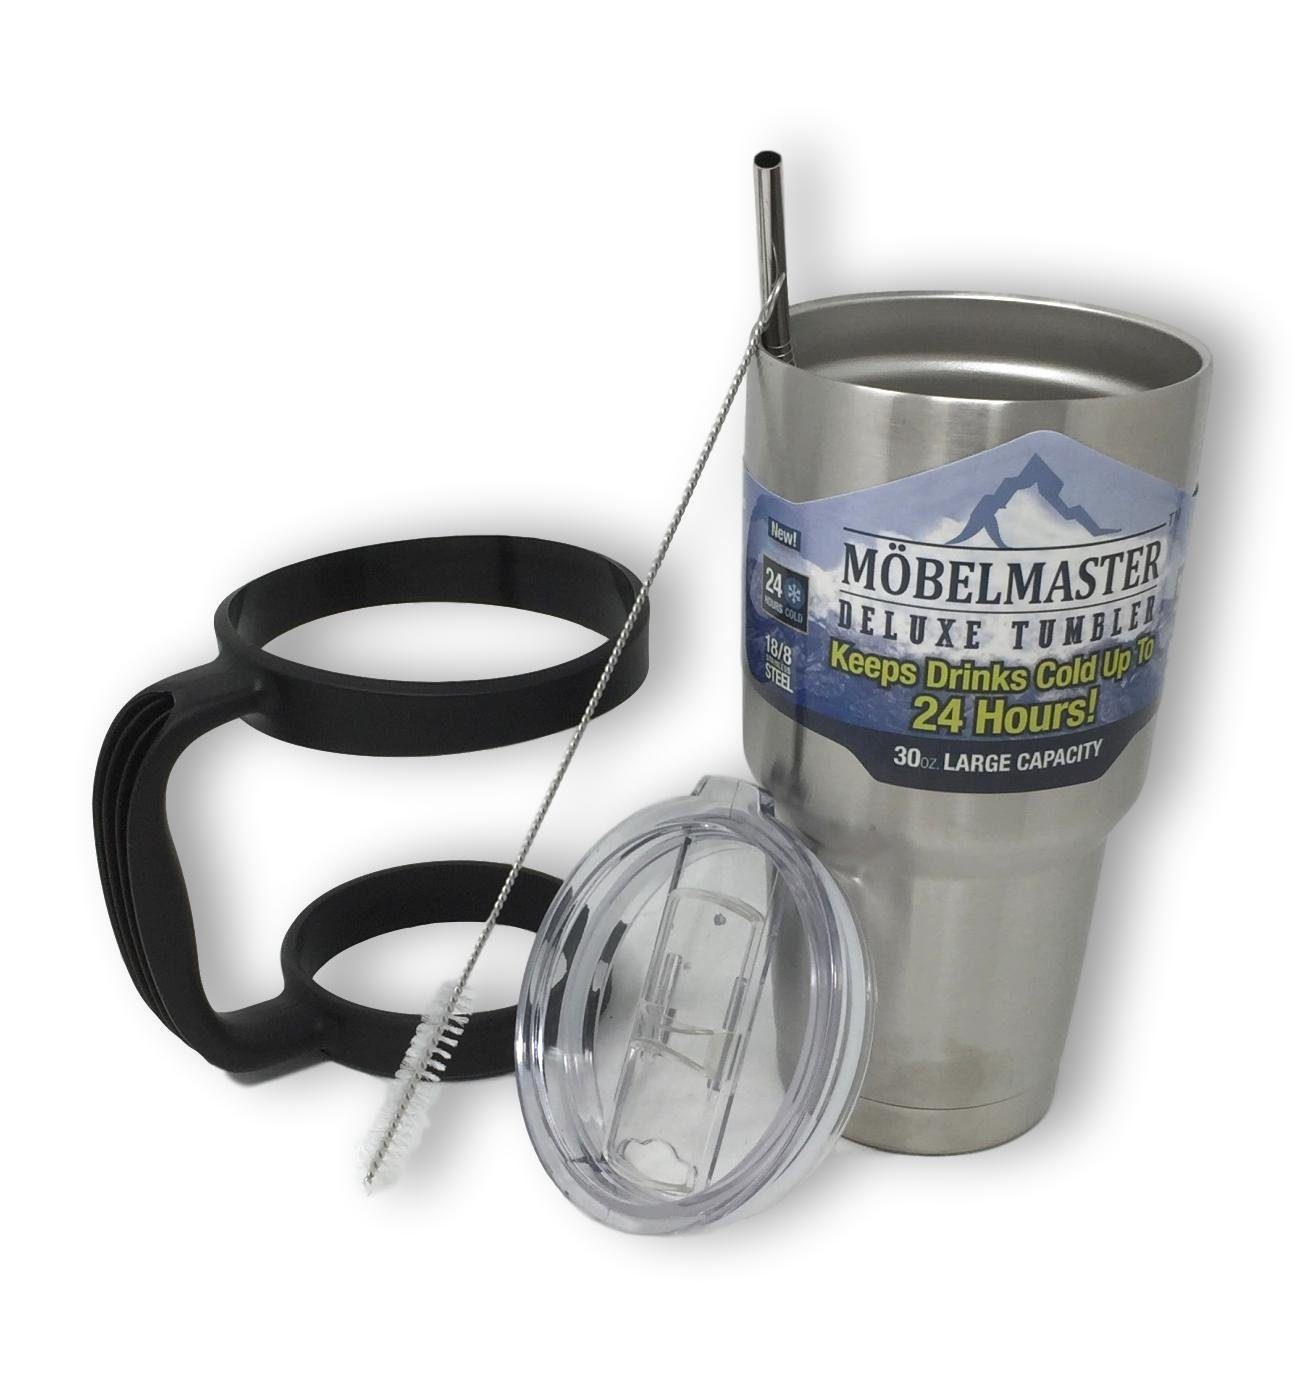 Möbelmaster 30oz Tumbler Vacuum Insulated Double Wall Coffee & Tea Cup Travel Mug 304 Stainless Steel (Brush Metal)